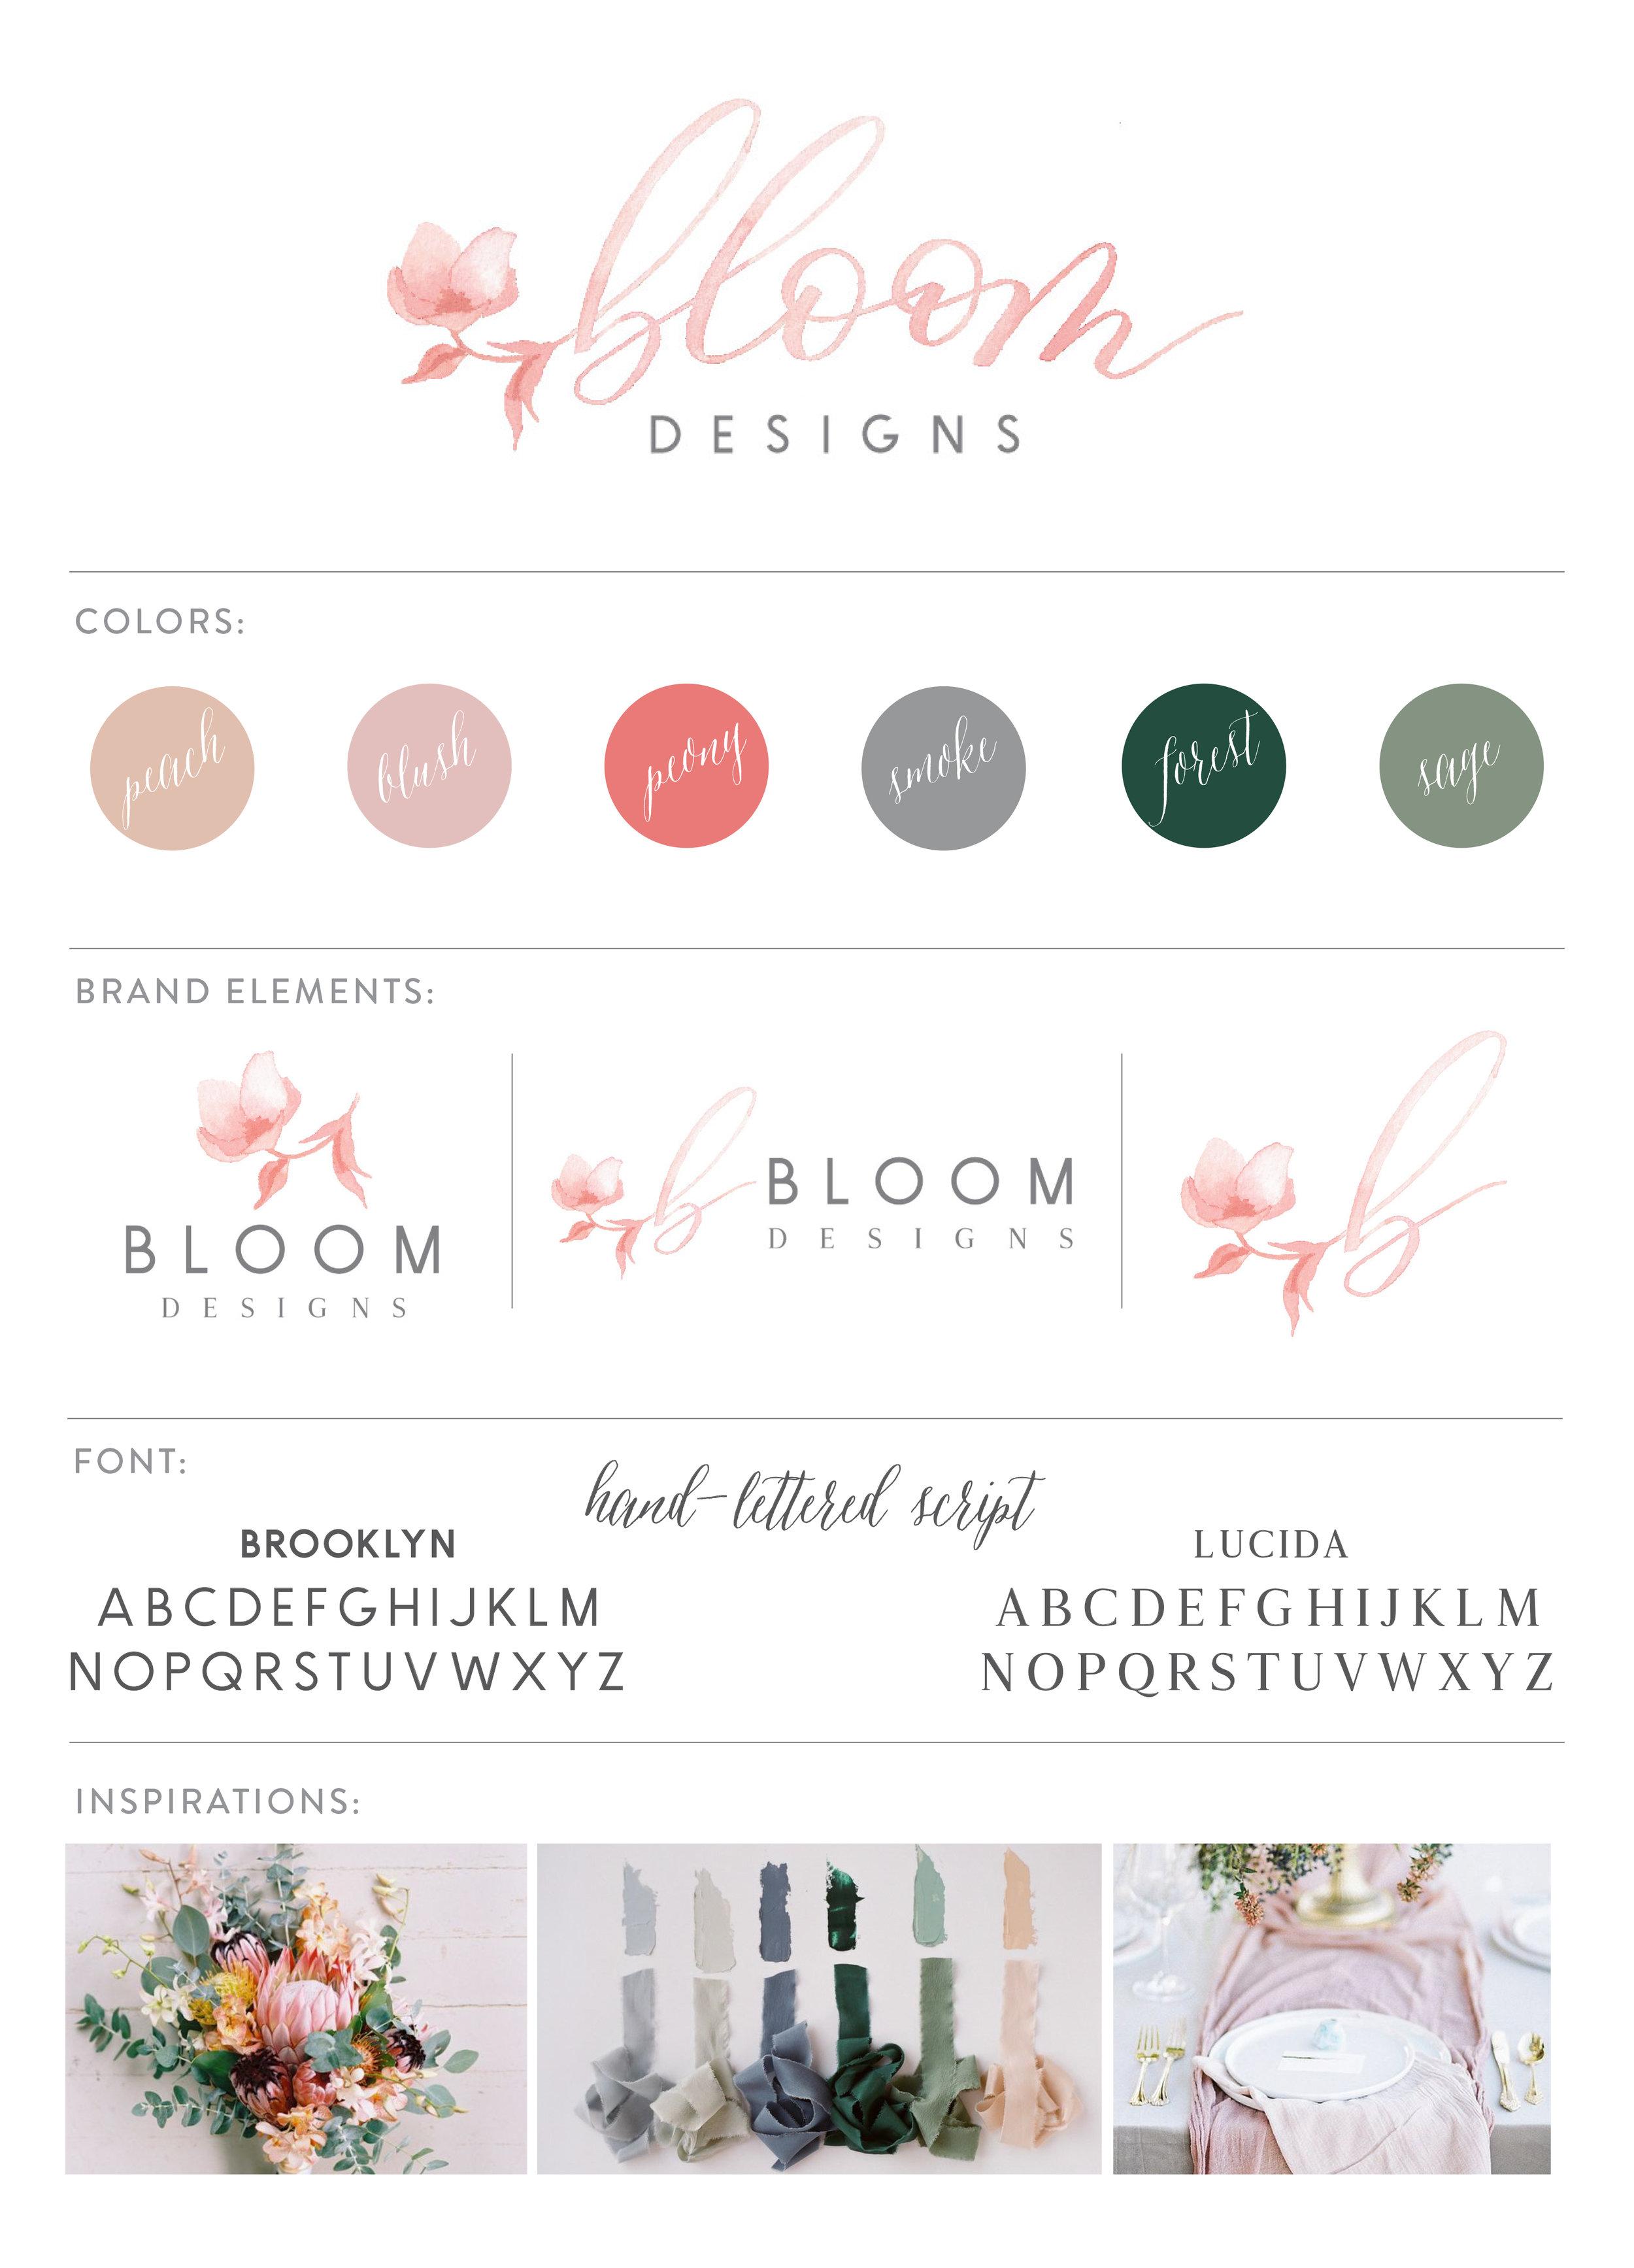 Kuepers, Kate - Branding Board - Updated Blush.jpg